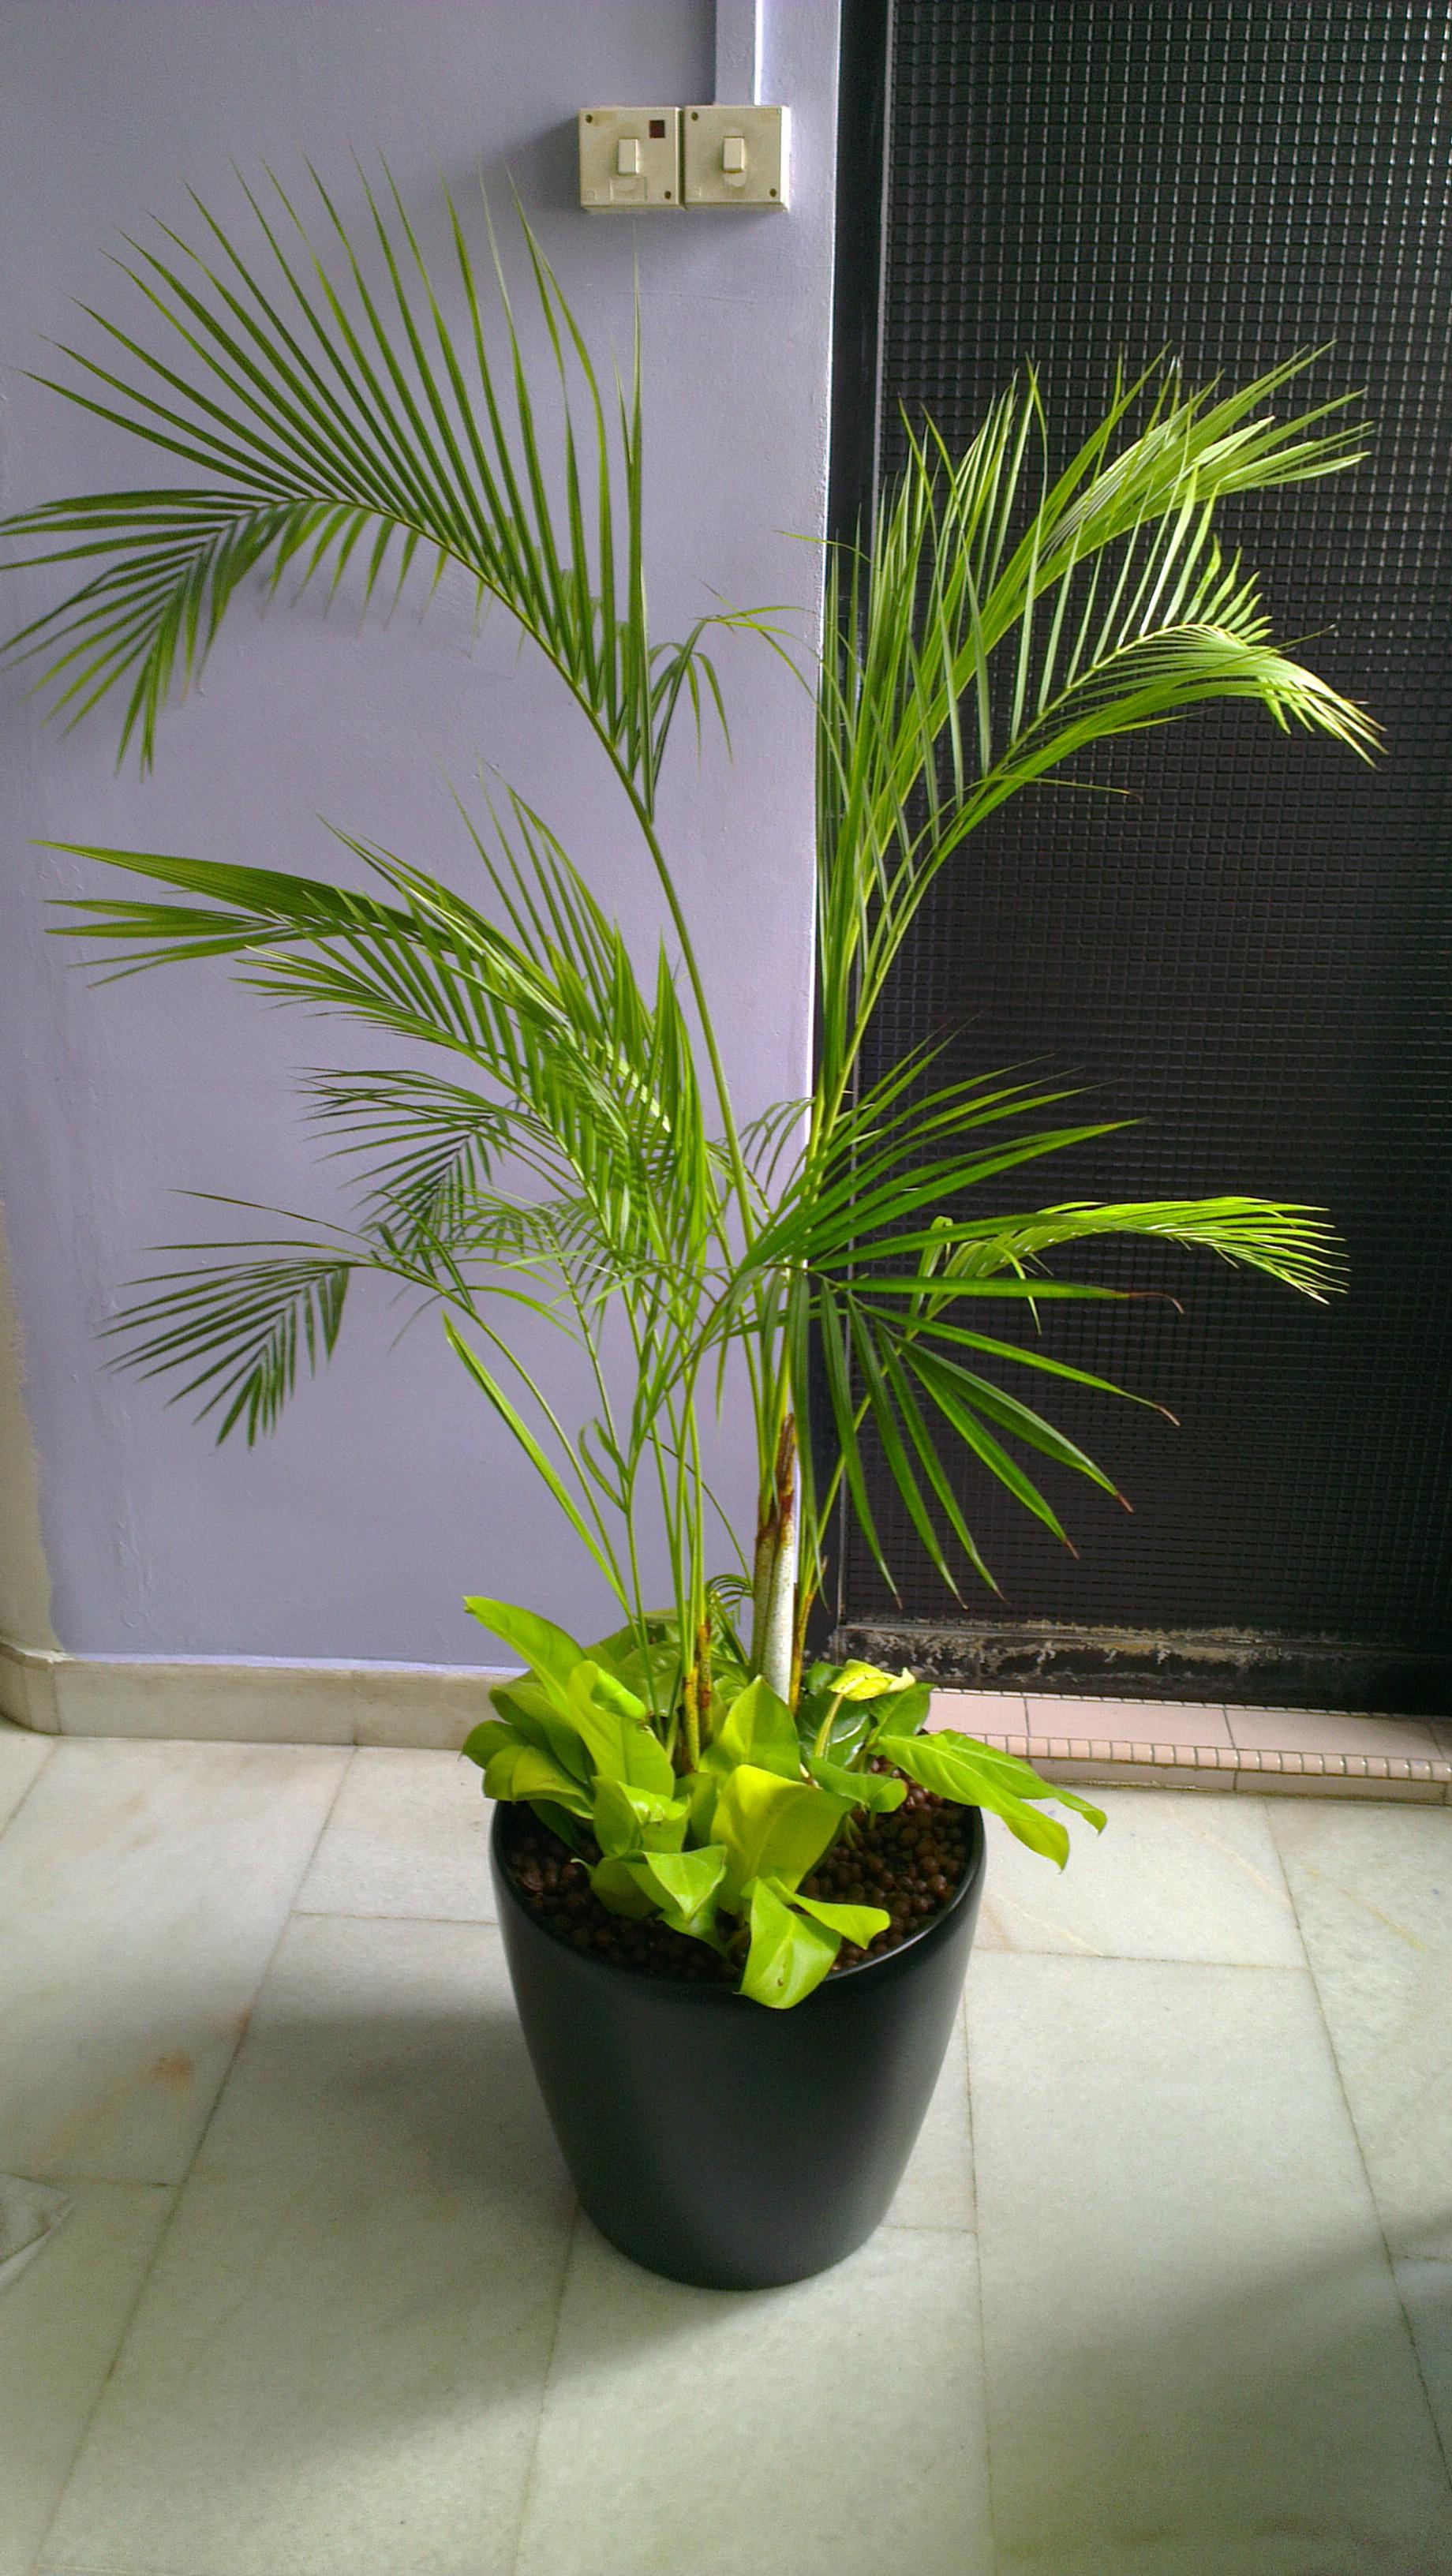 Yellow Palm 3-4ft in Fibre Pot